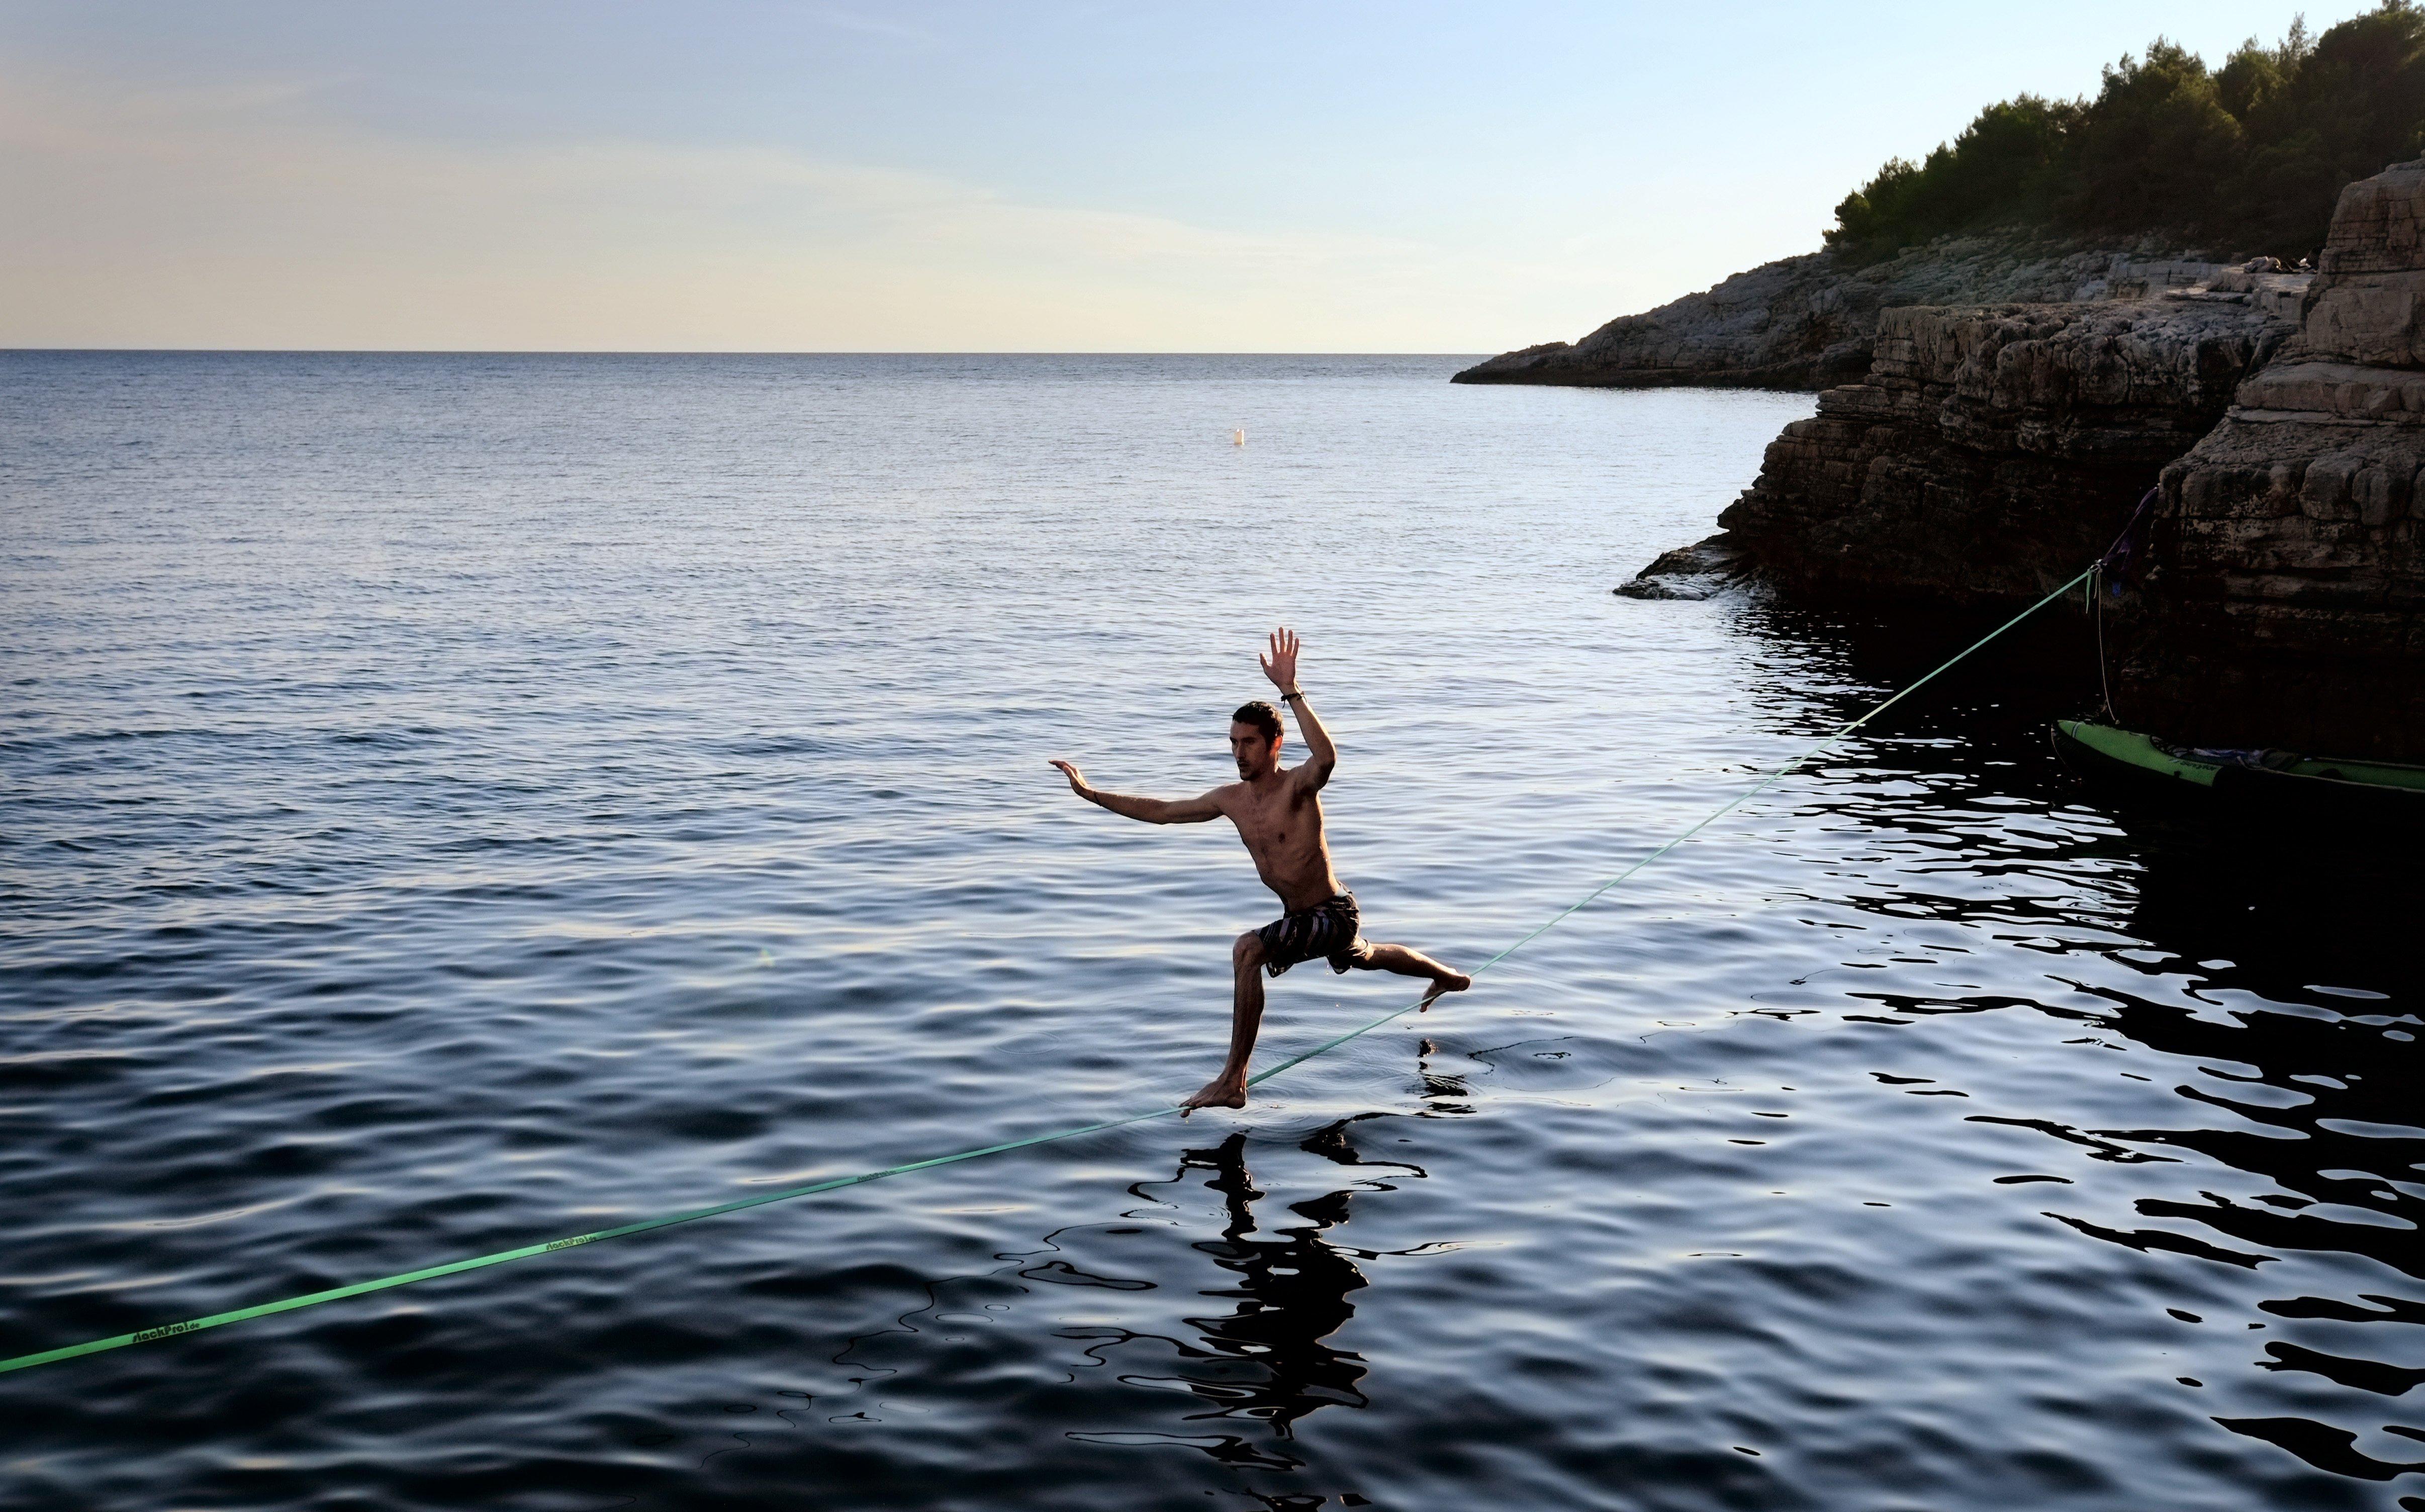 Aug. 5, 2014.  A climber walks over a slackline at the cliffs of Stoja near Pula, Croatia.